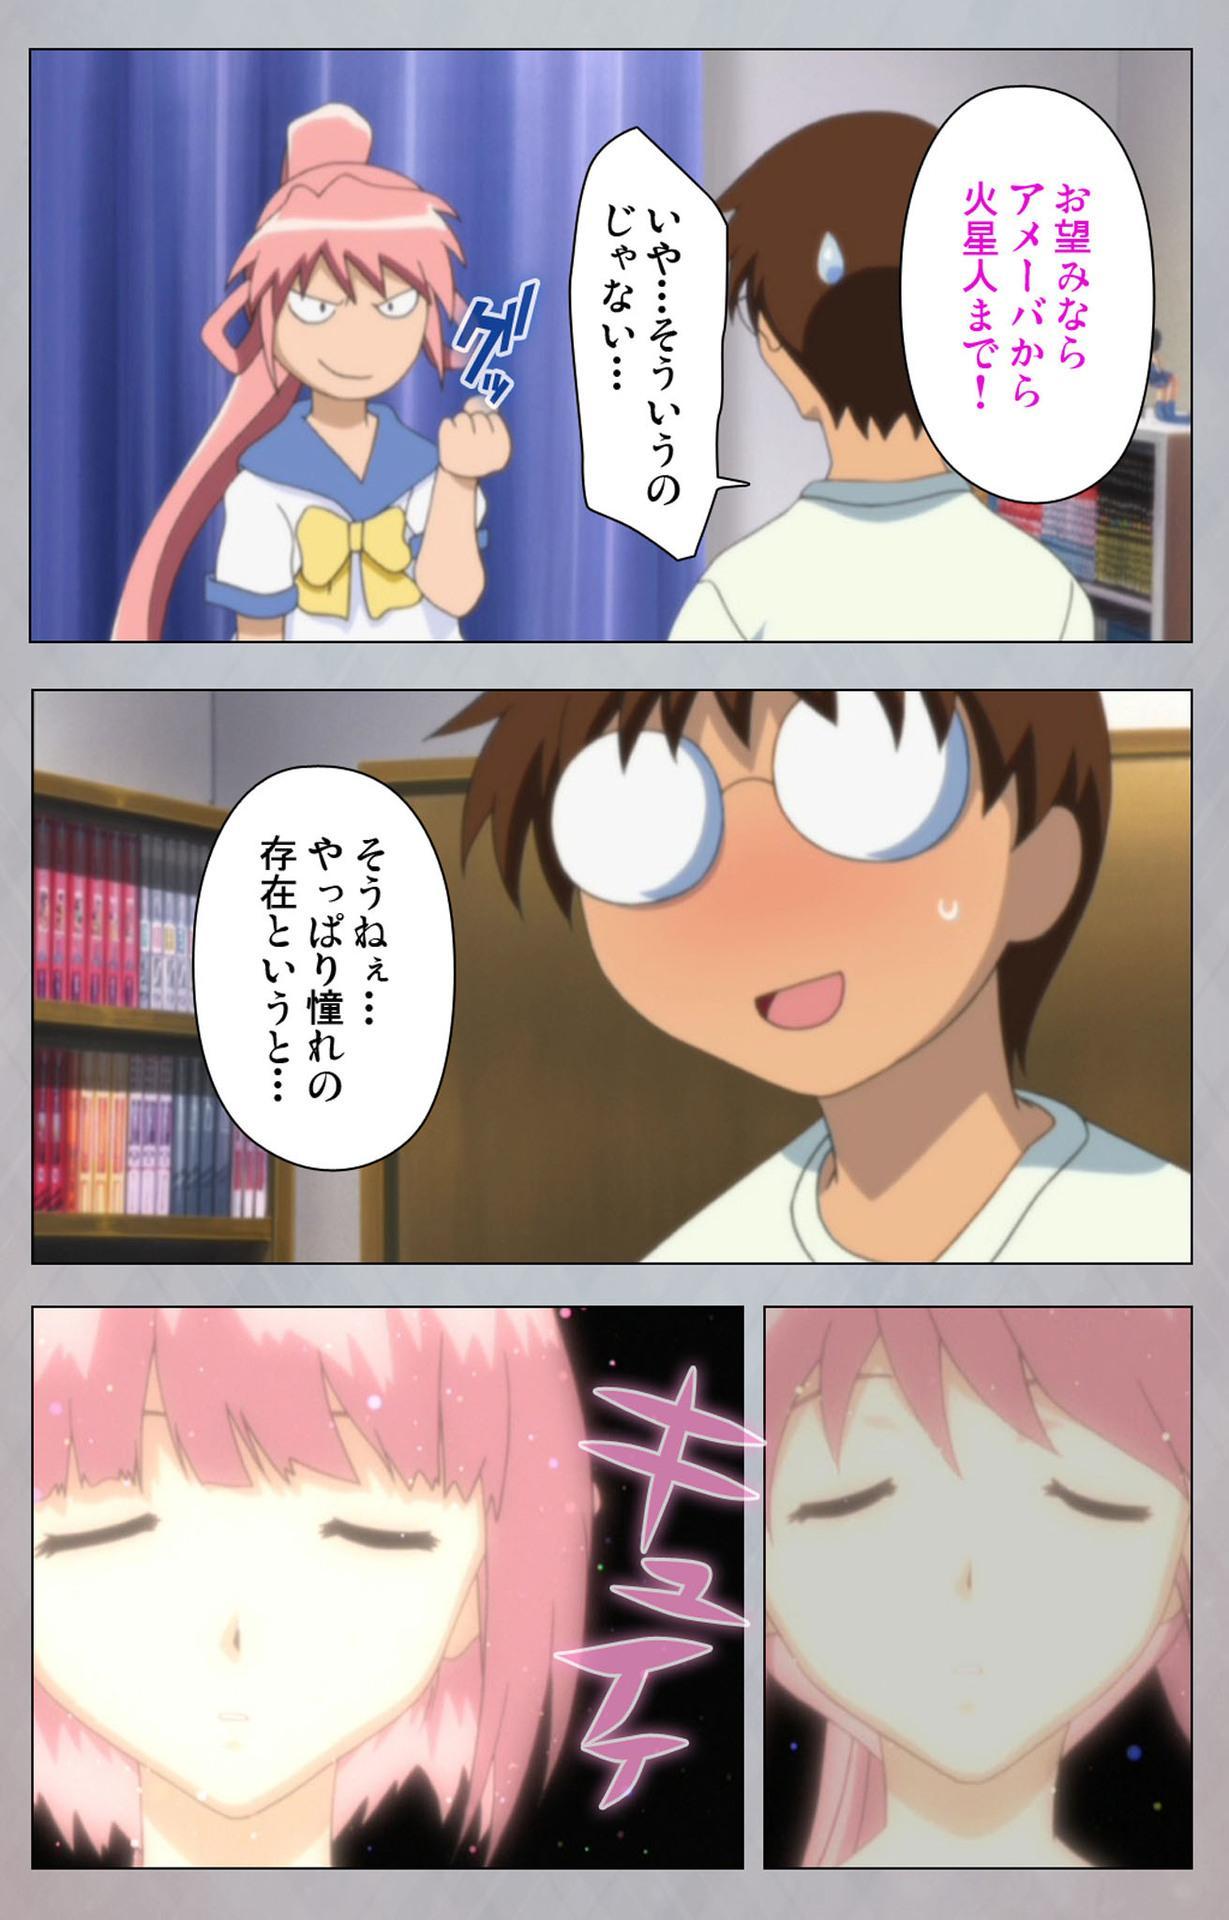 [Digital Works] [Full Color Seijin Ban] Sex Android ~Risou no Onna de Nuite yaru~ Kanzenban 62